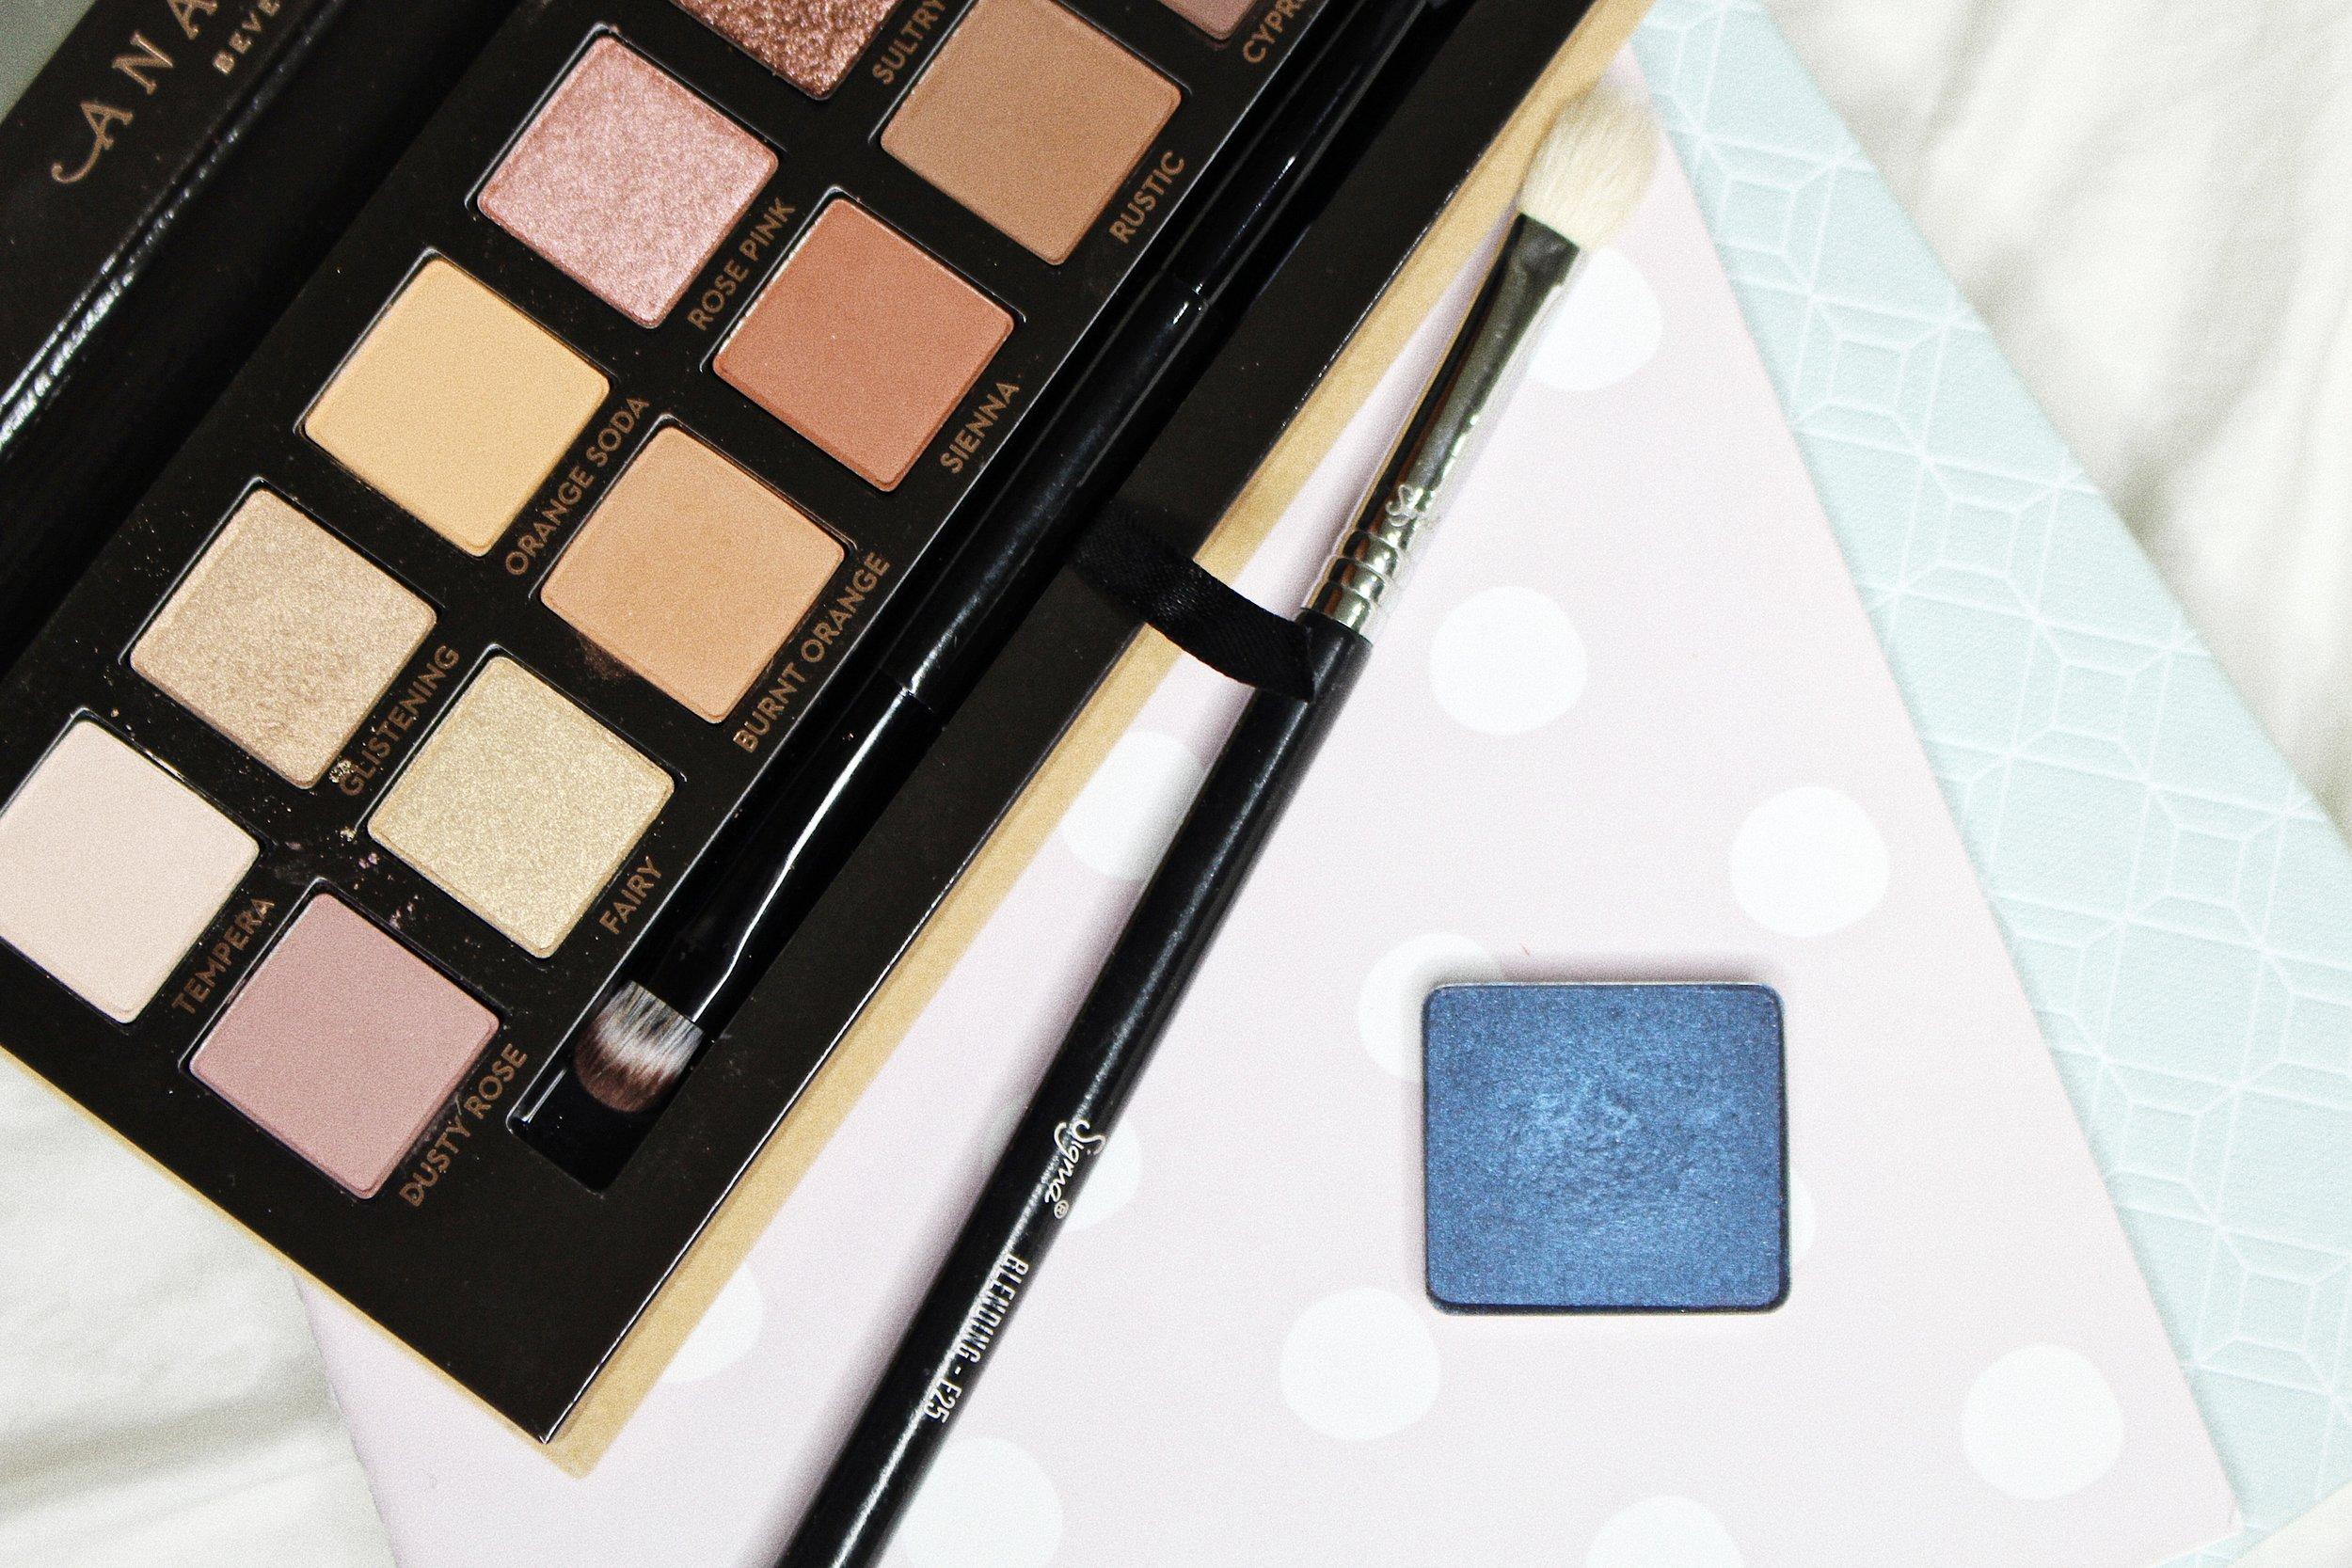 soft glam palette and inglot eyeshadow blue eyeshadow